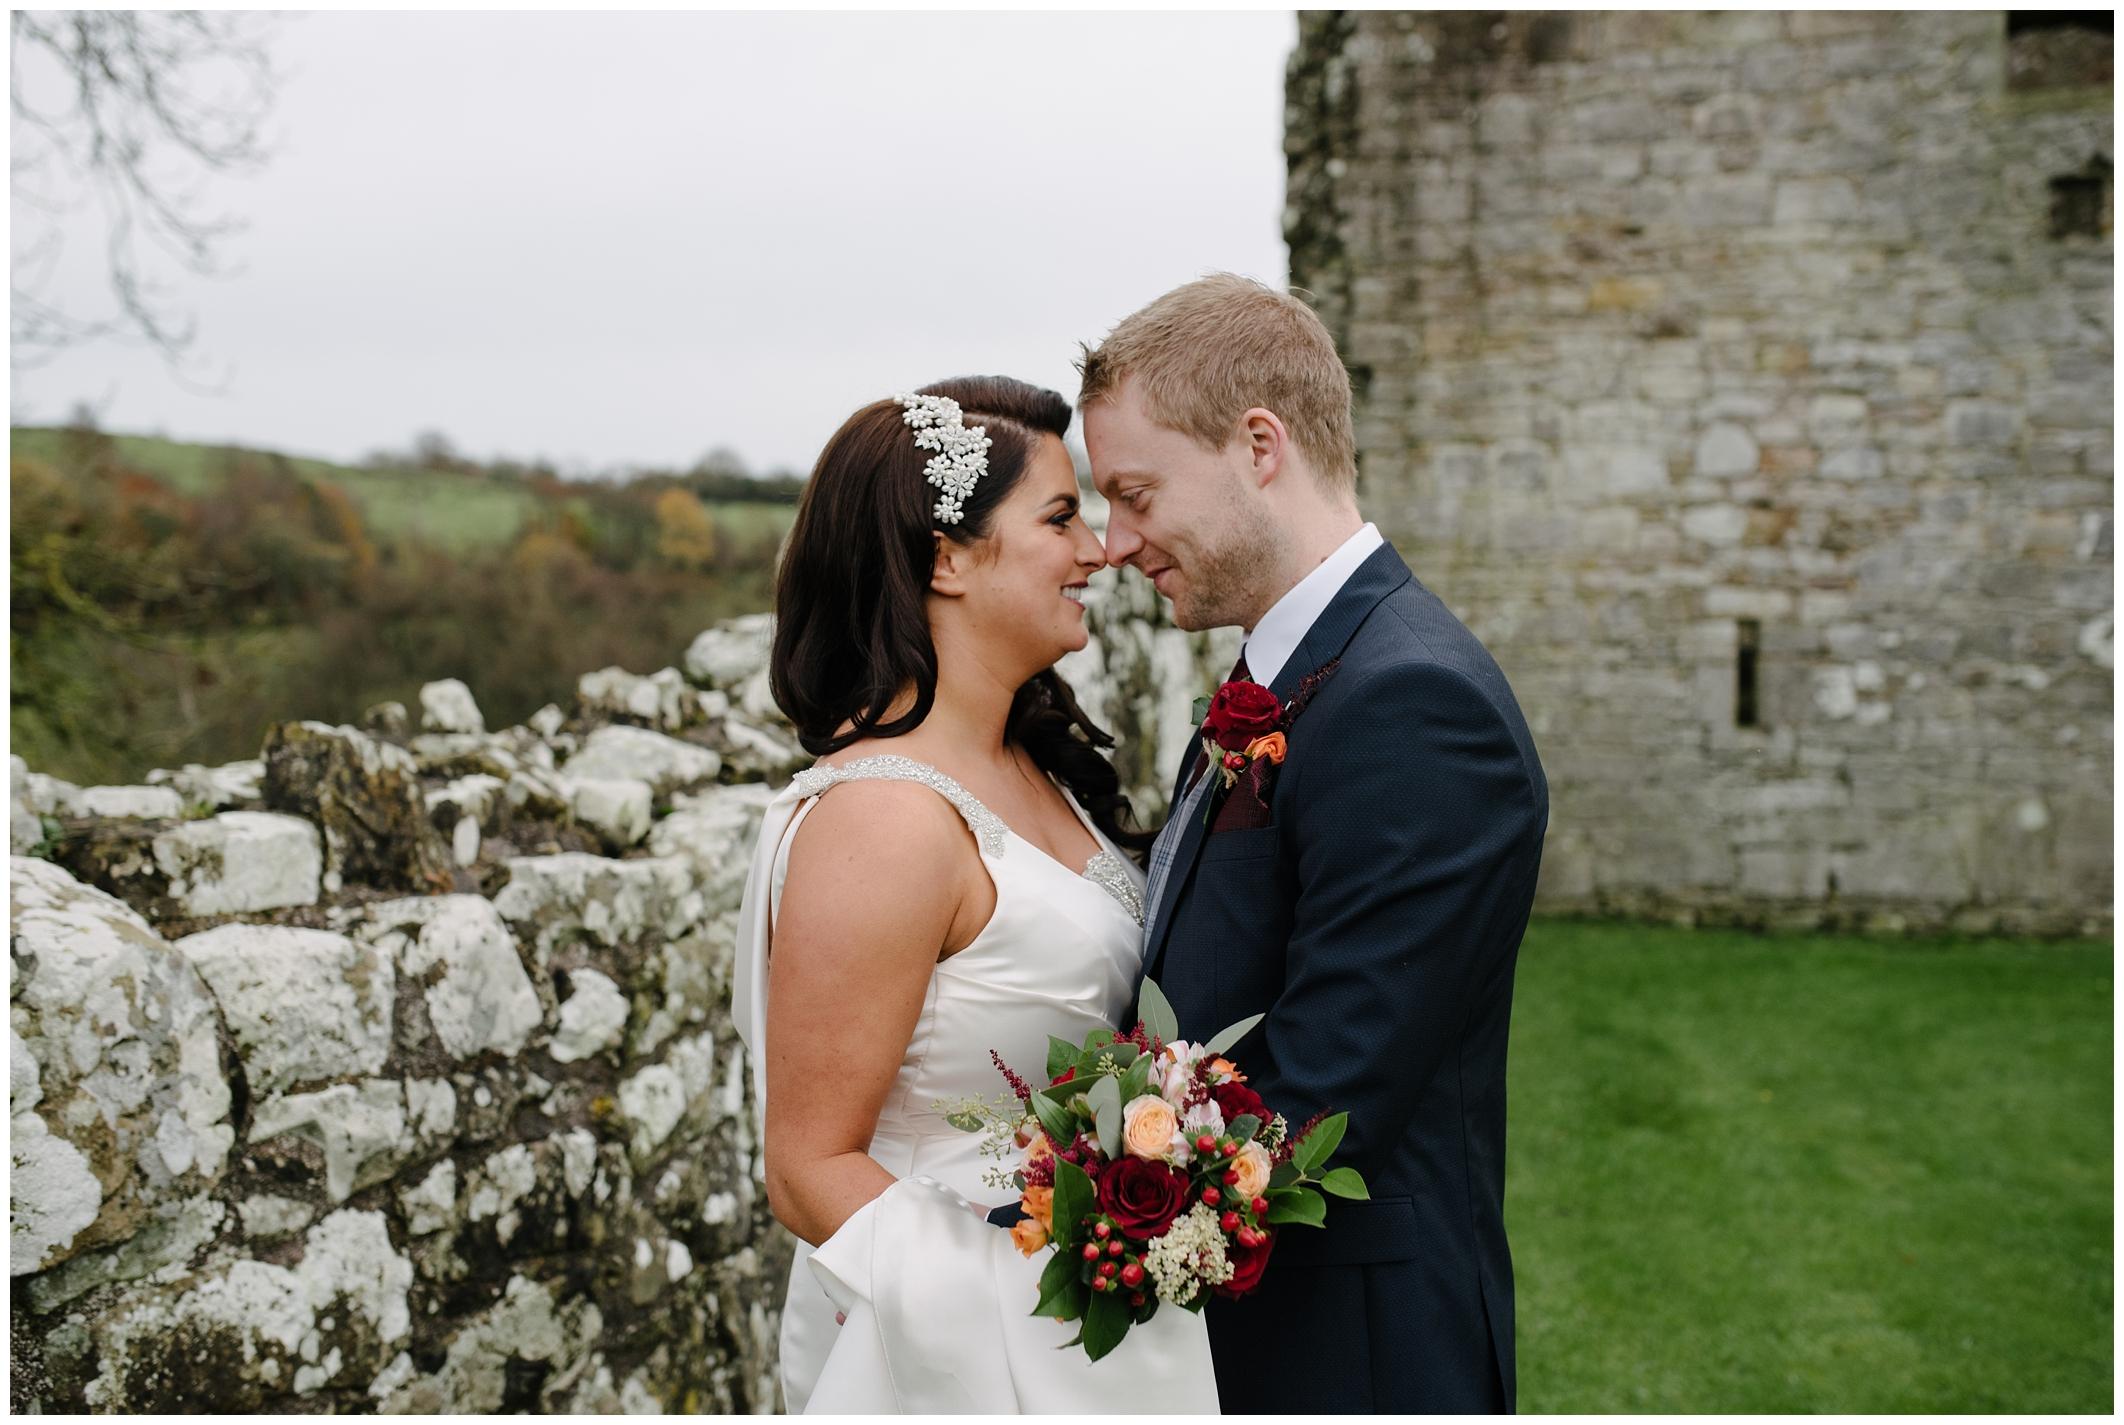 tracey_conor__wedding_jude_browne_photography_0057.jpg